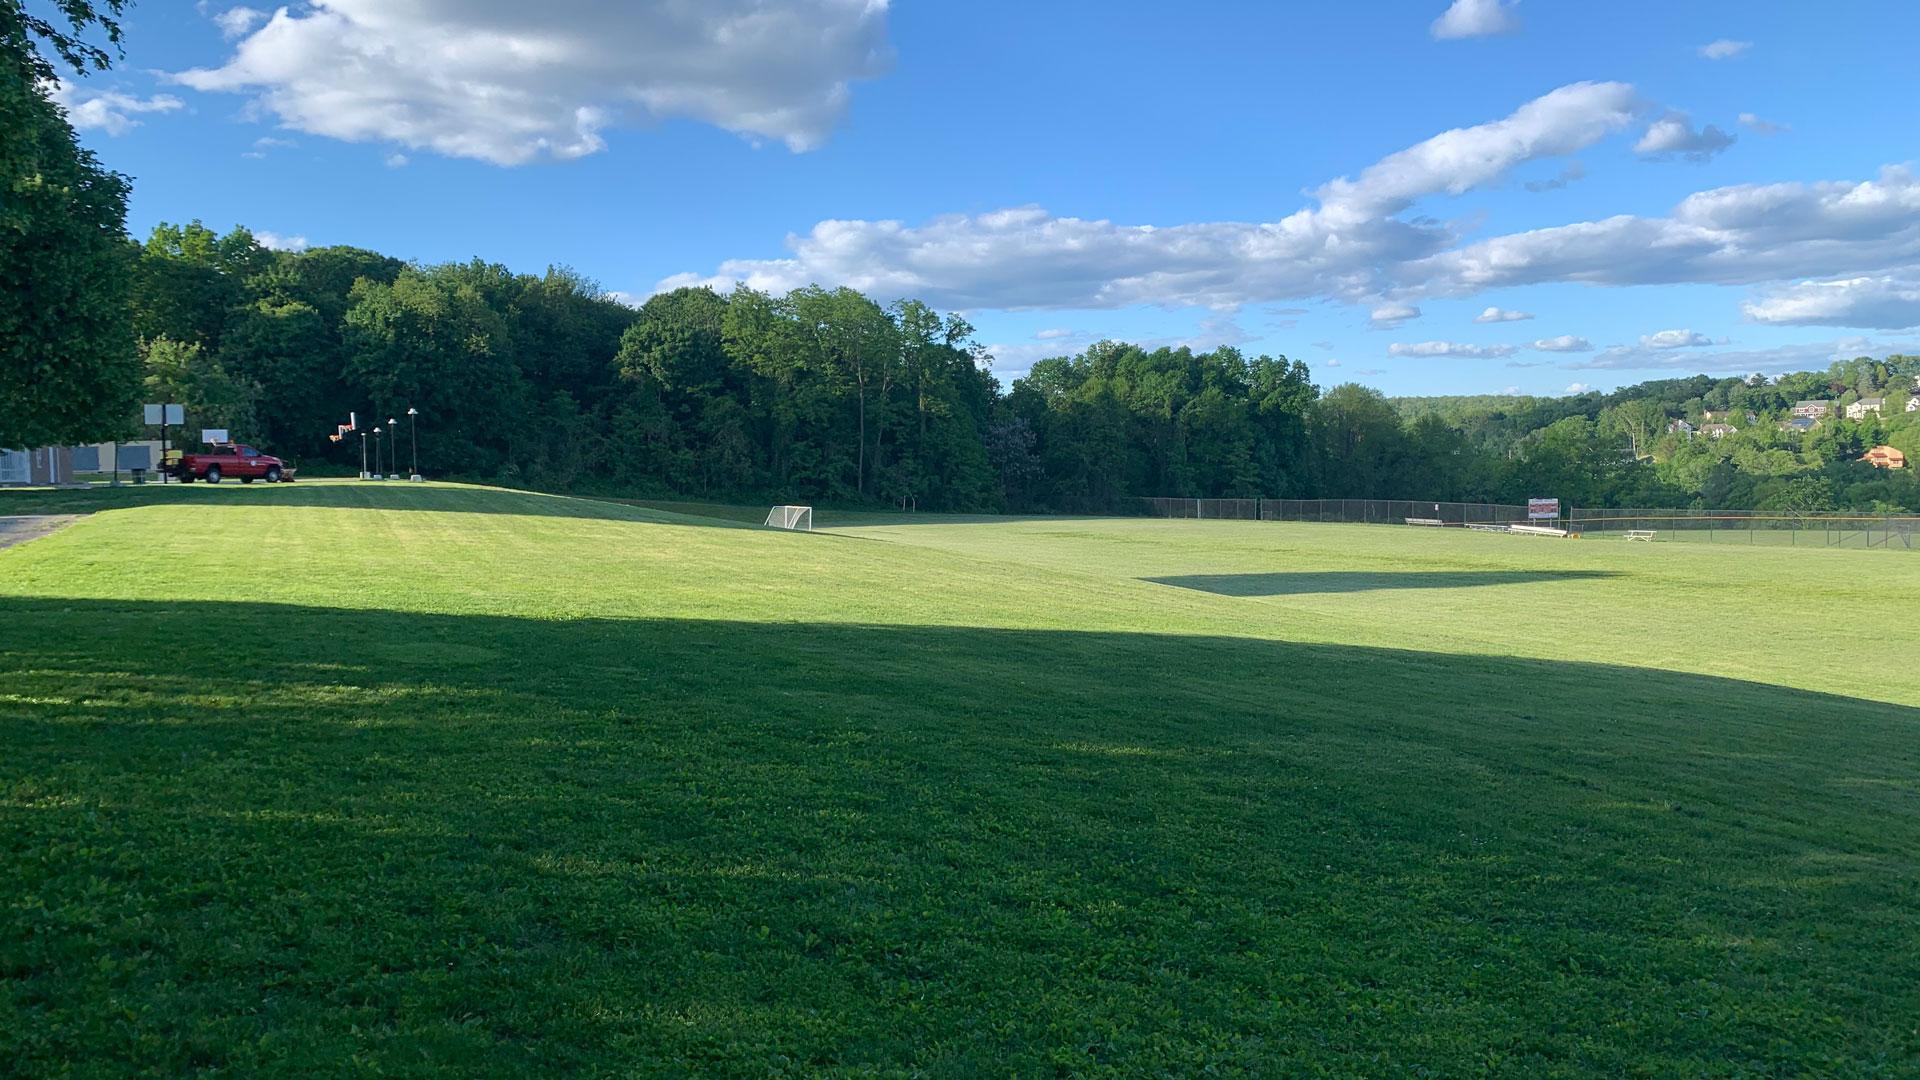 The Anne M. Dorner Middle School Soccer Field